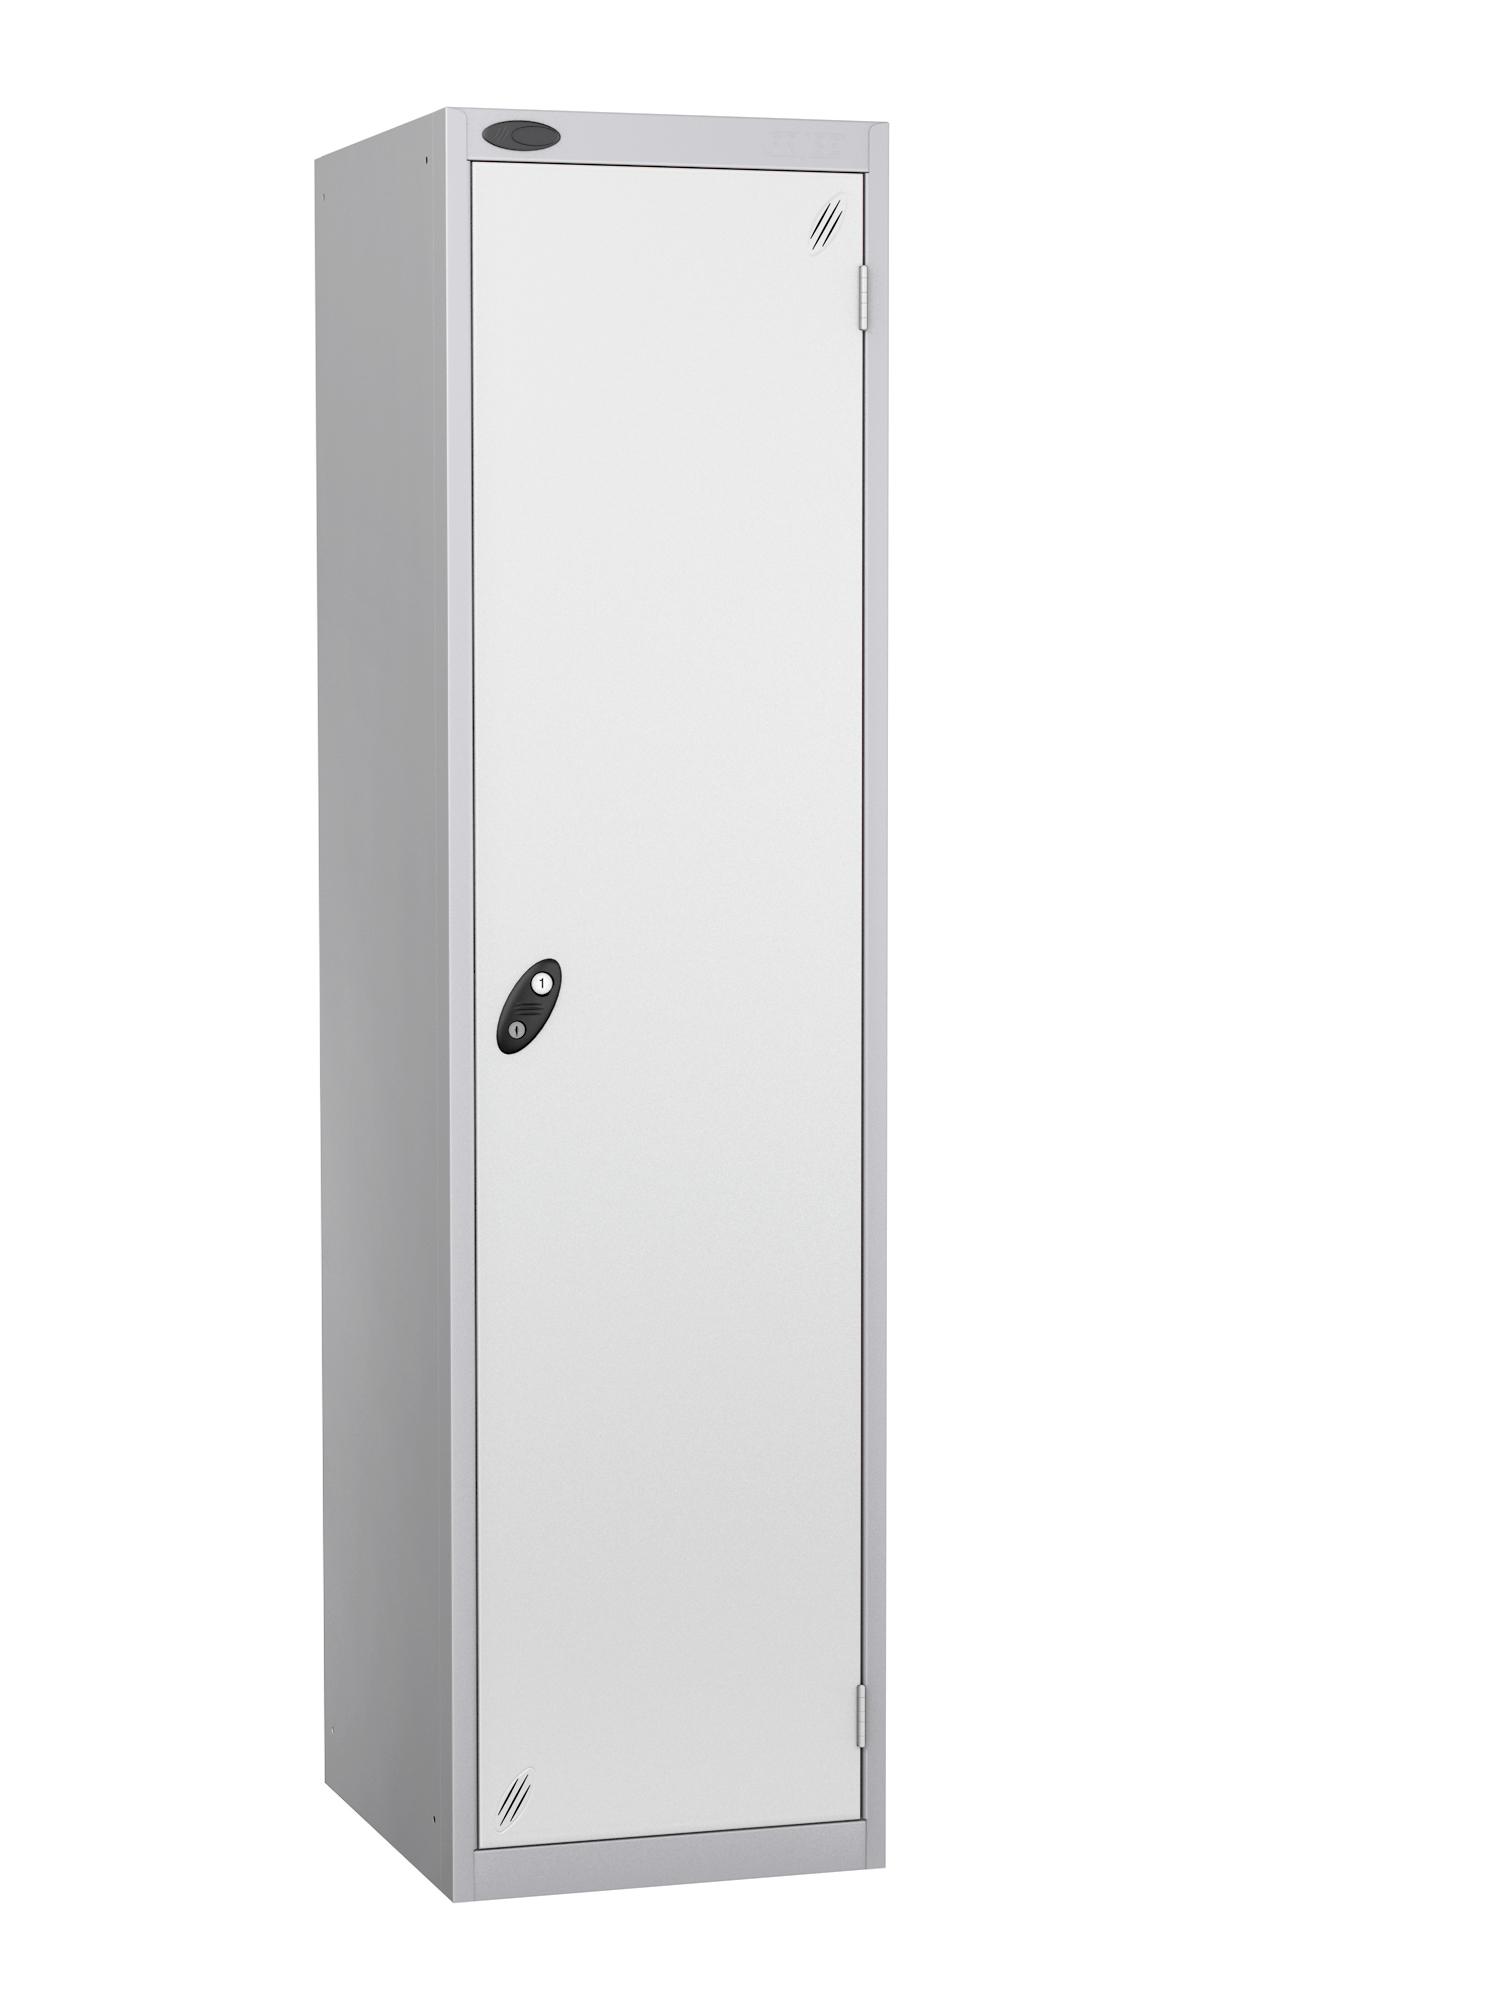 Probe high capacity specialist locker with white door